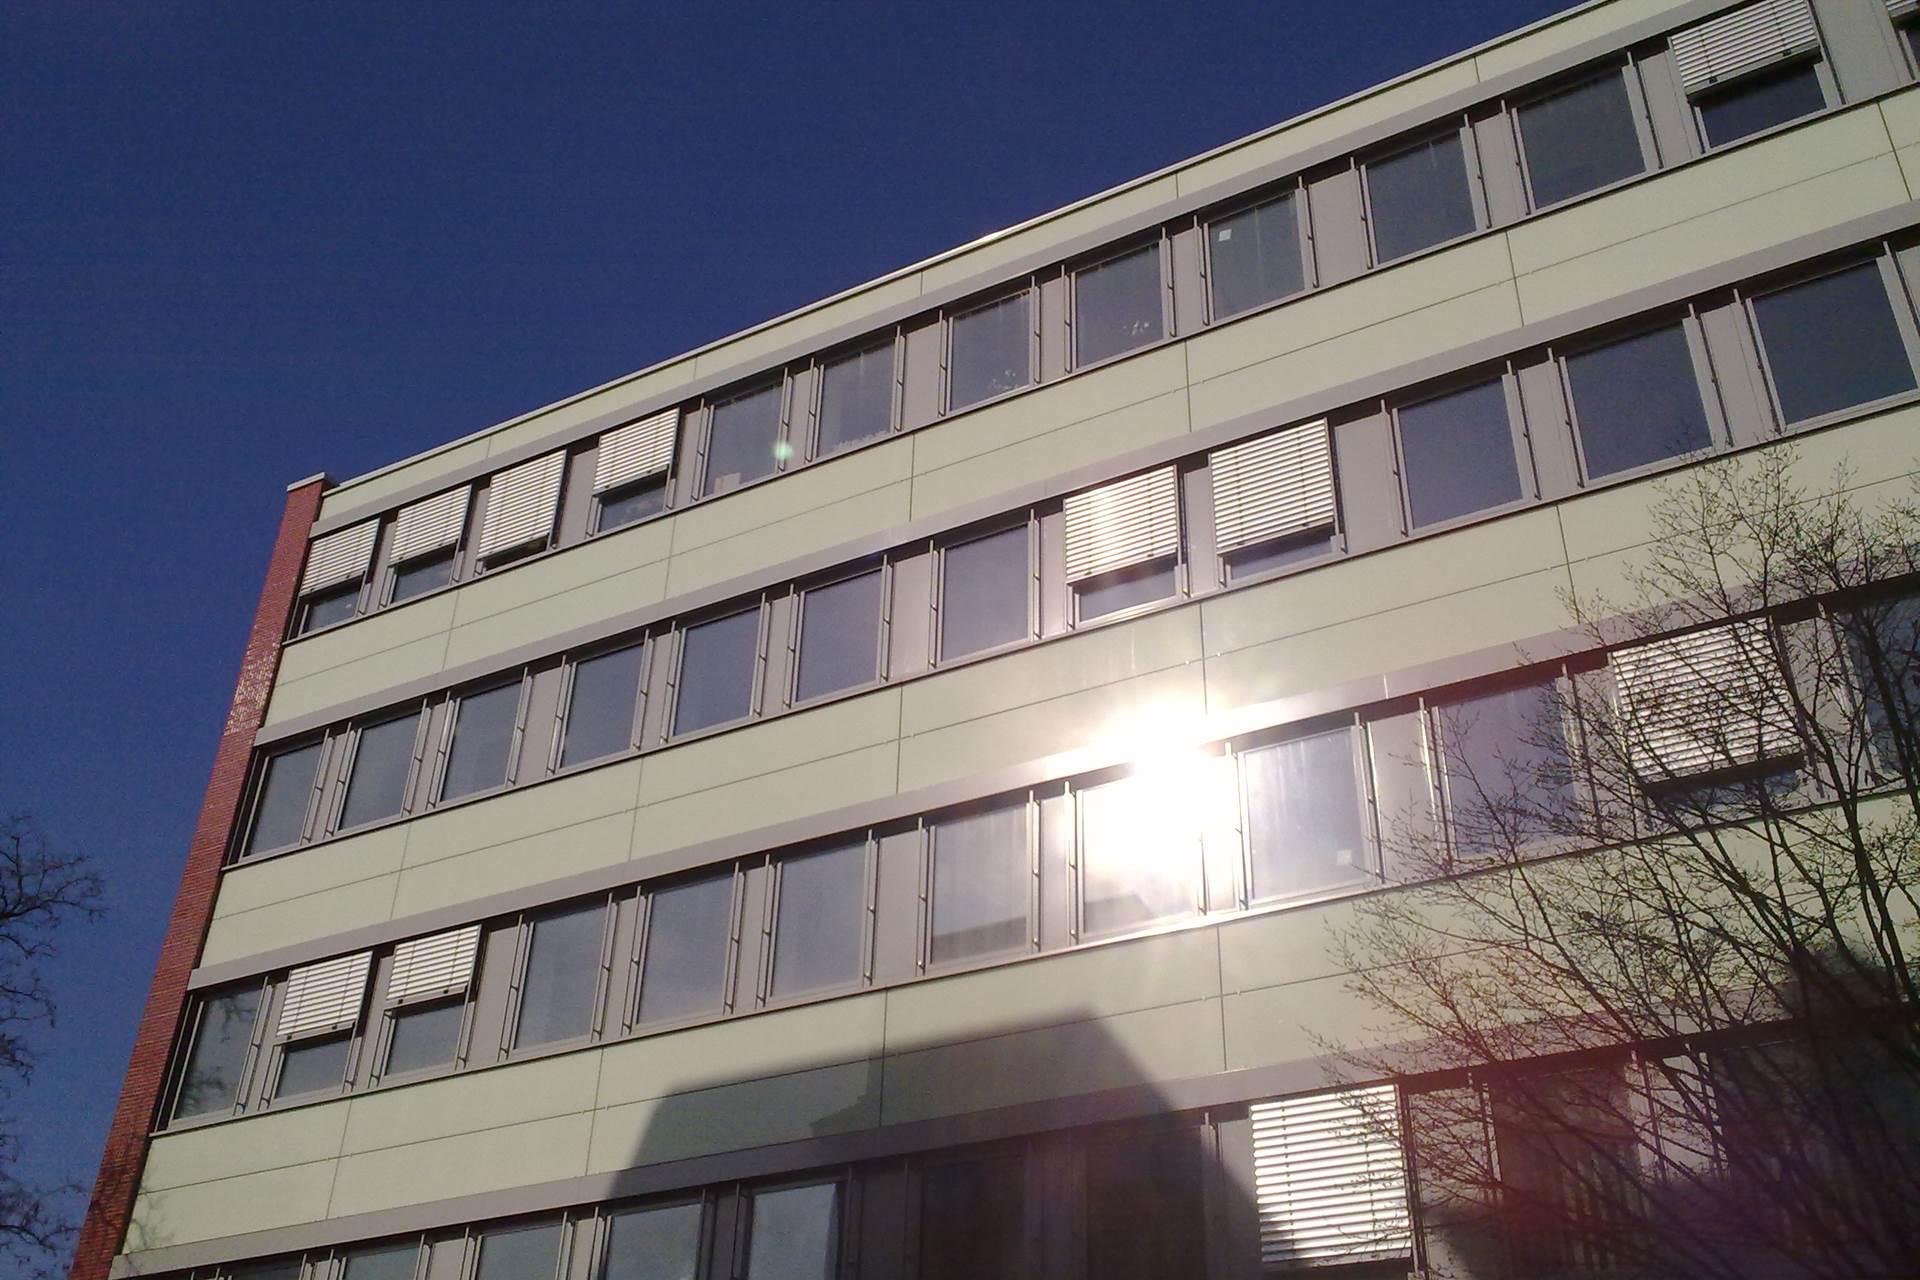 Mannheim Kinderklinik